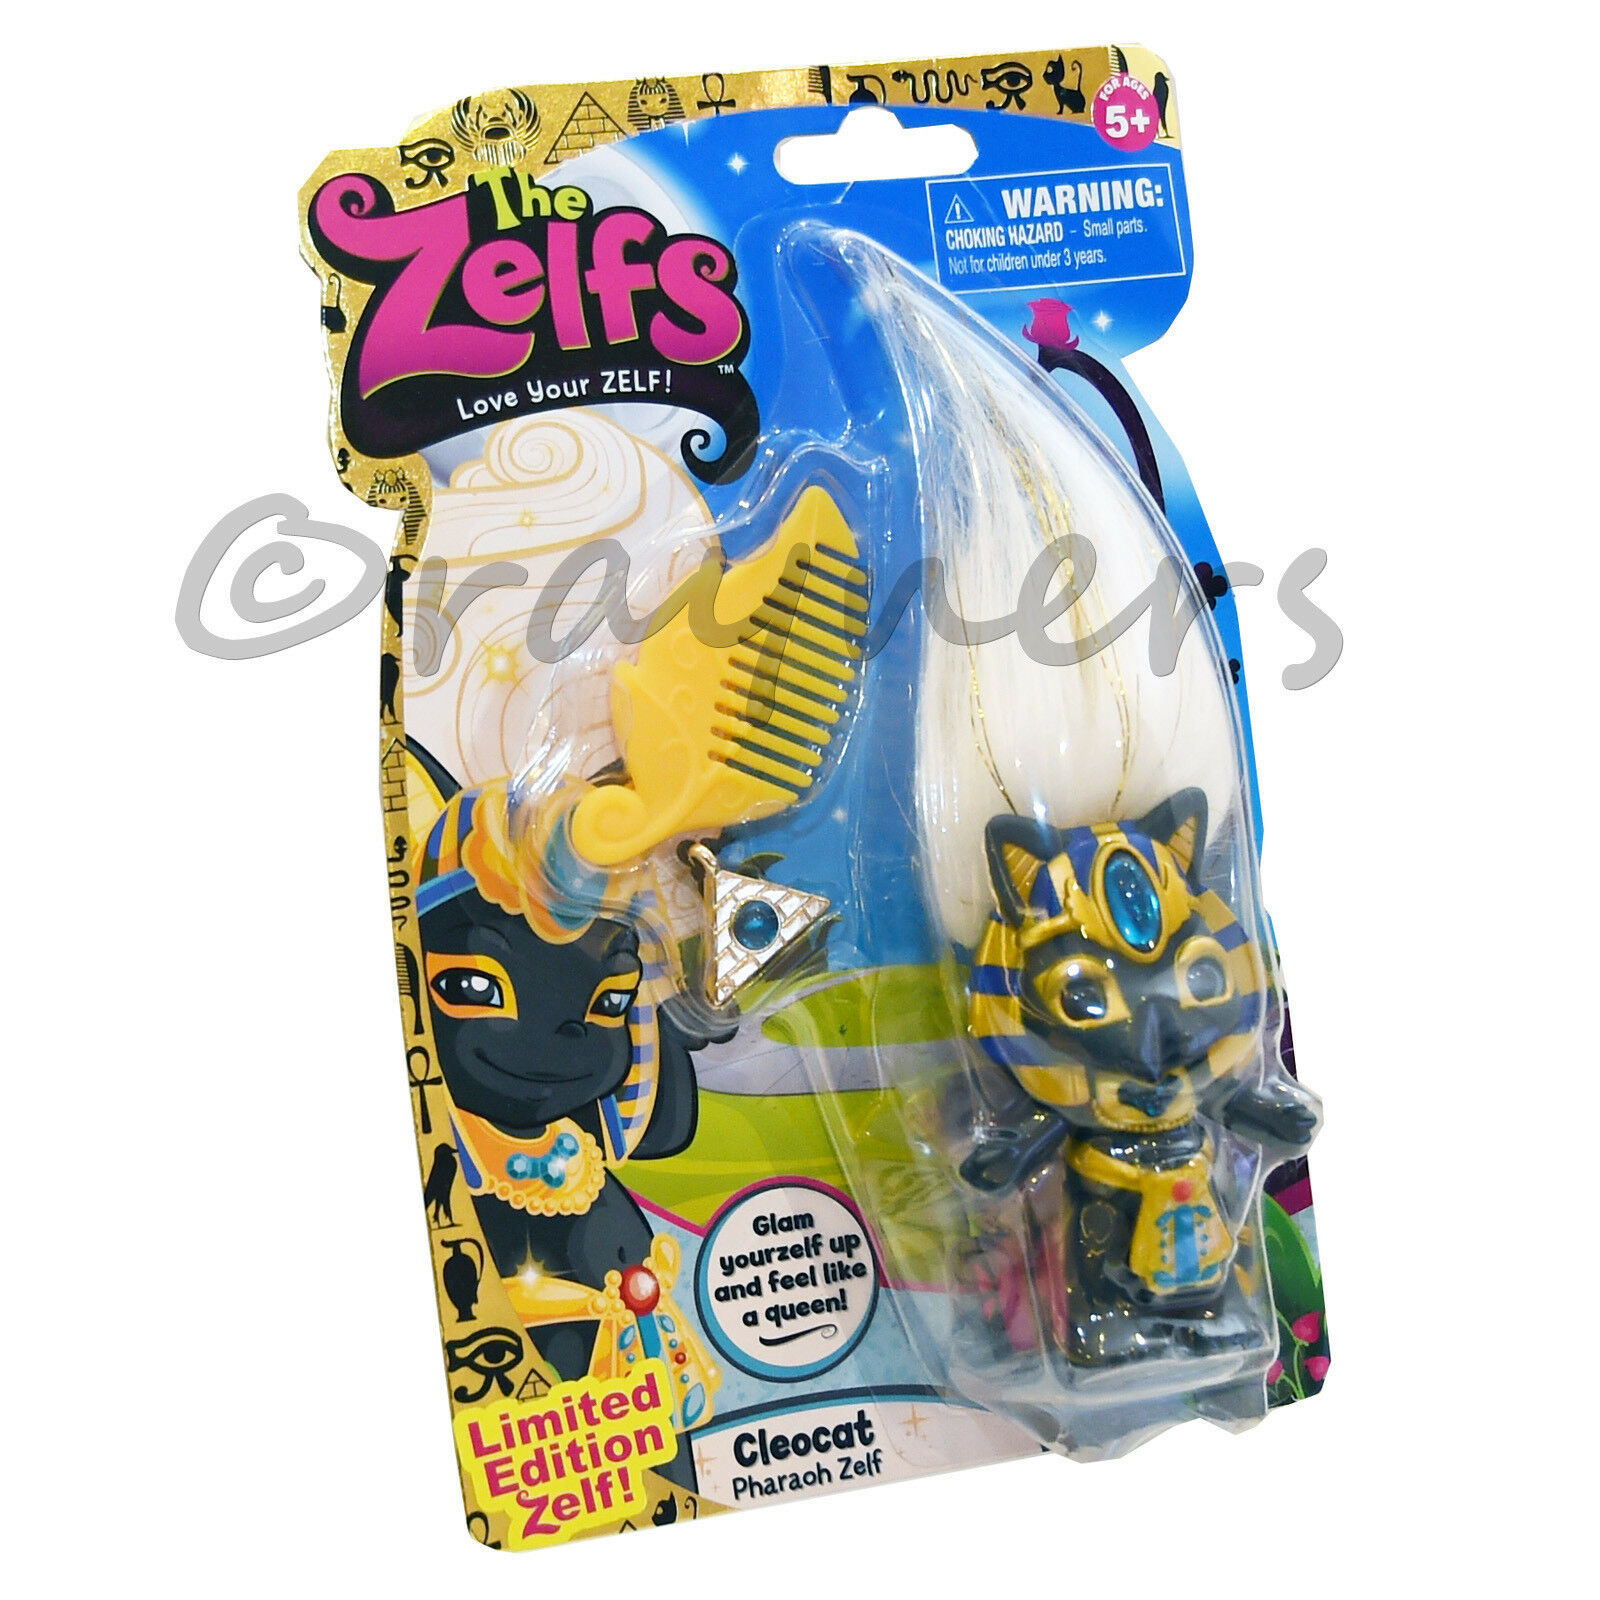 New The Zelfs Cleocat Limited Edition Series 4 Medium Zelf (Pharaoh Zelf)